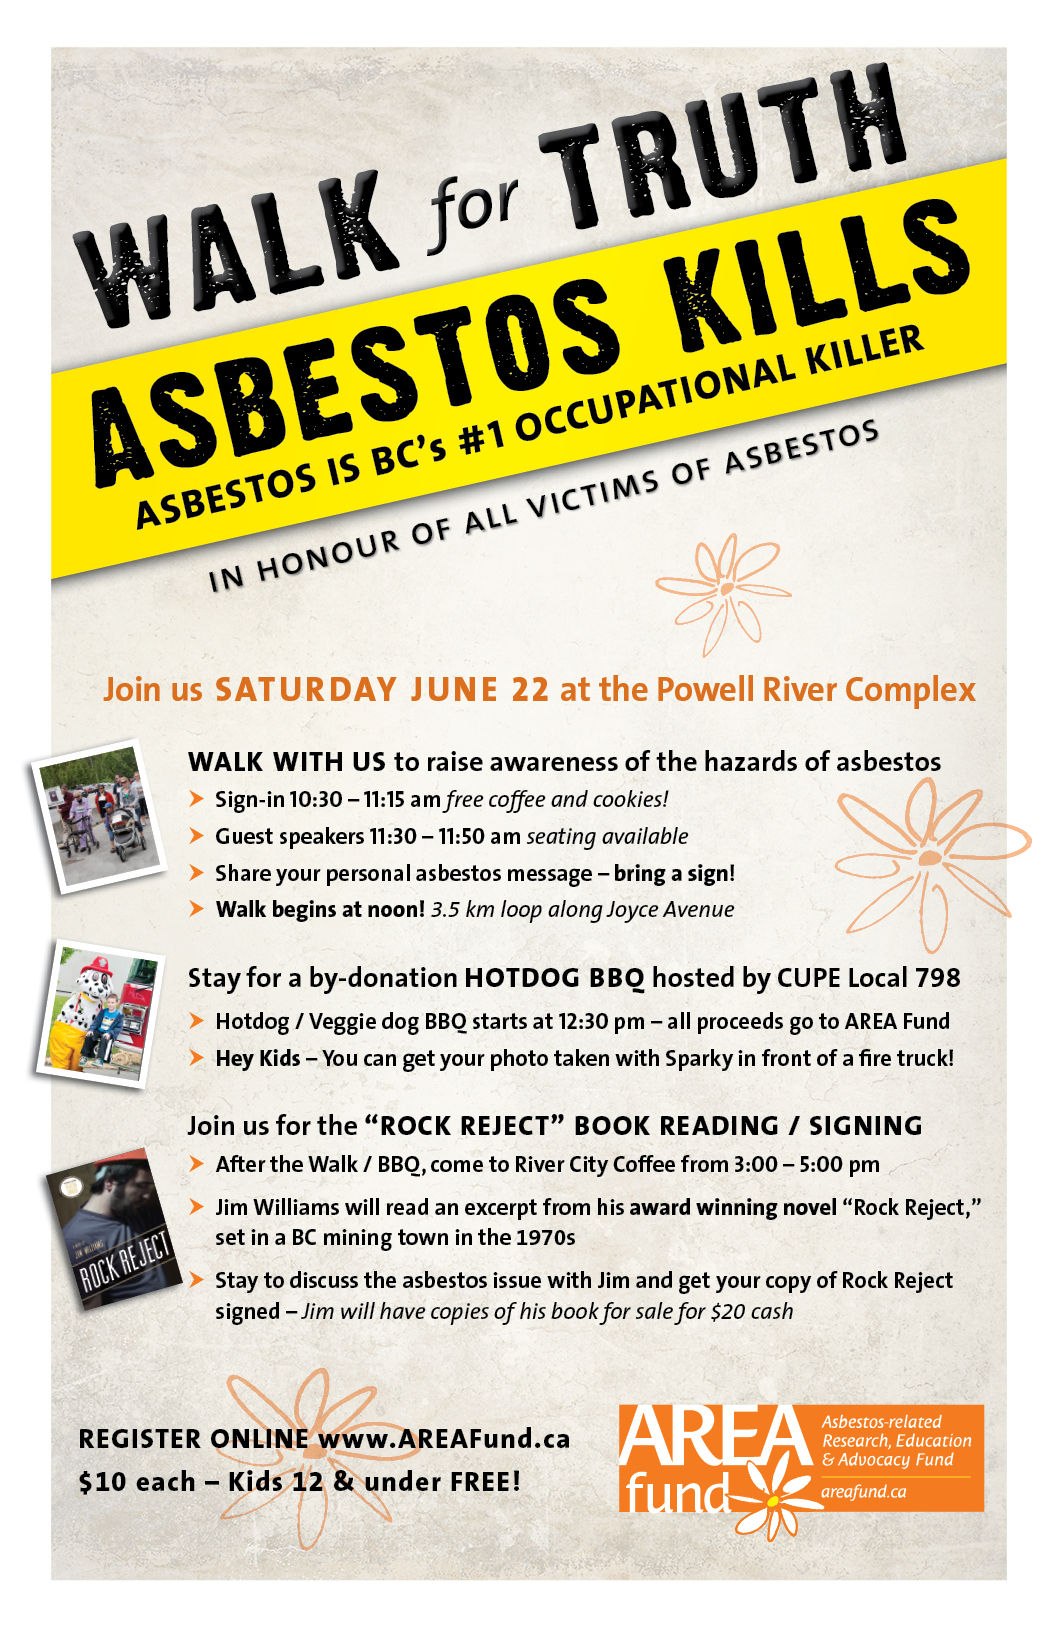 Walk for Truth – Asbestos Kills | Partnership for Work